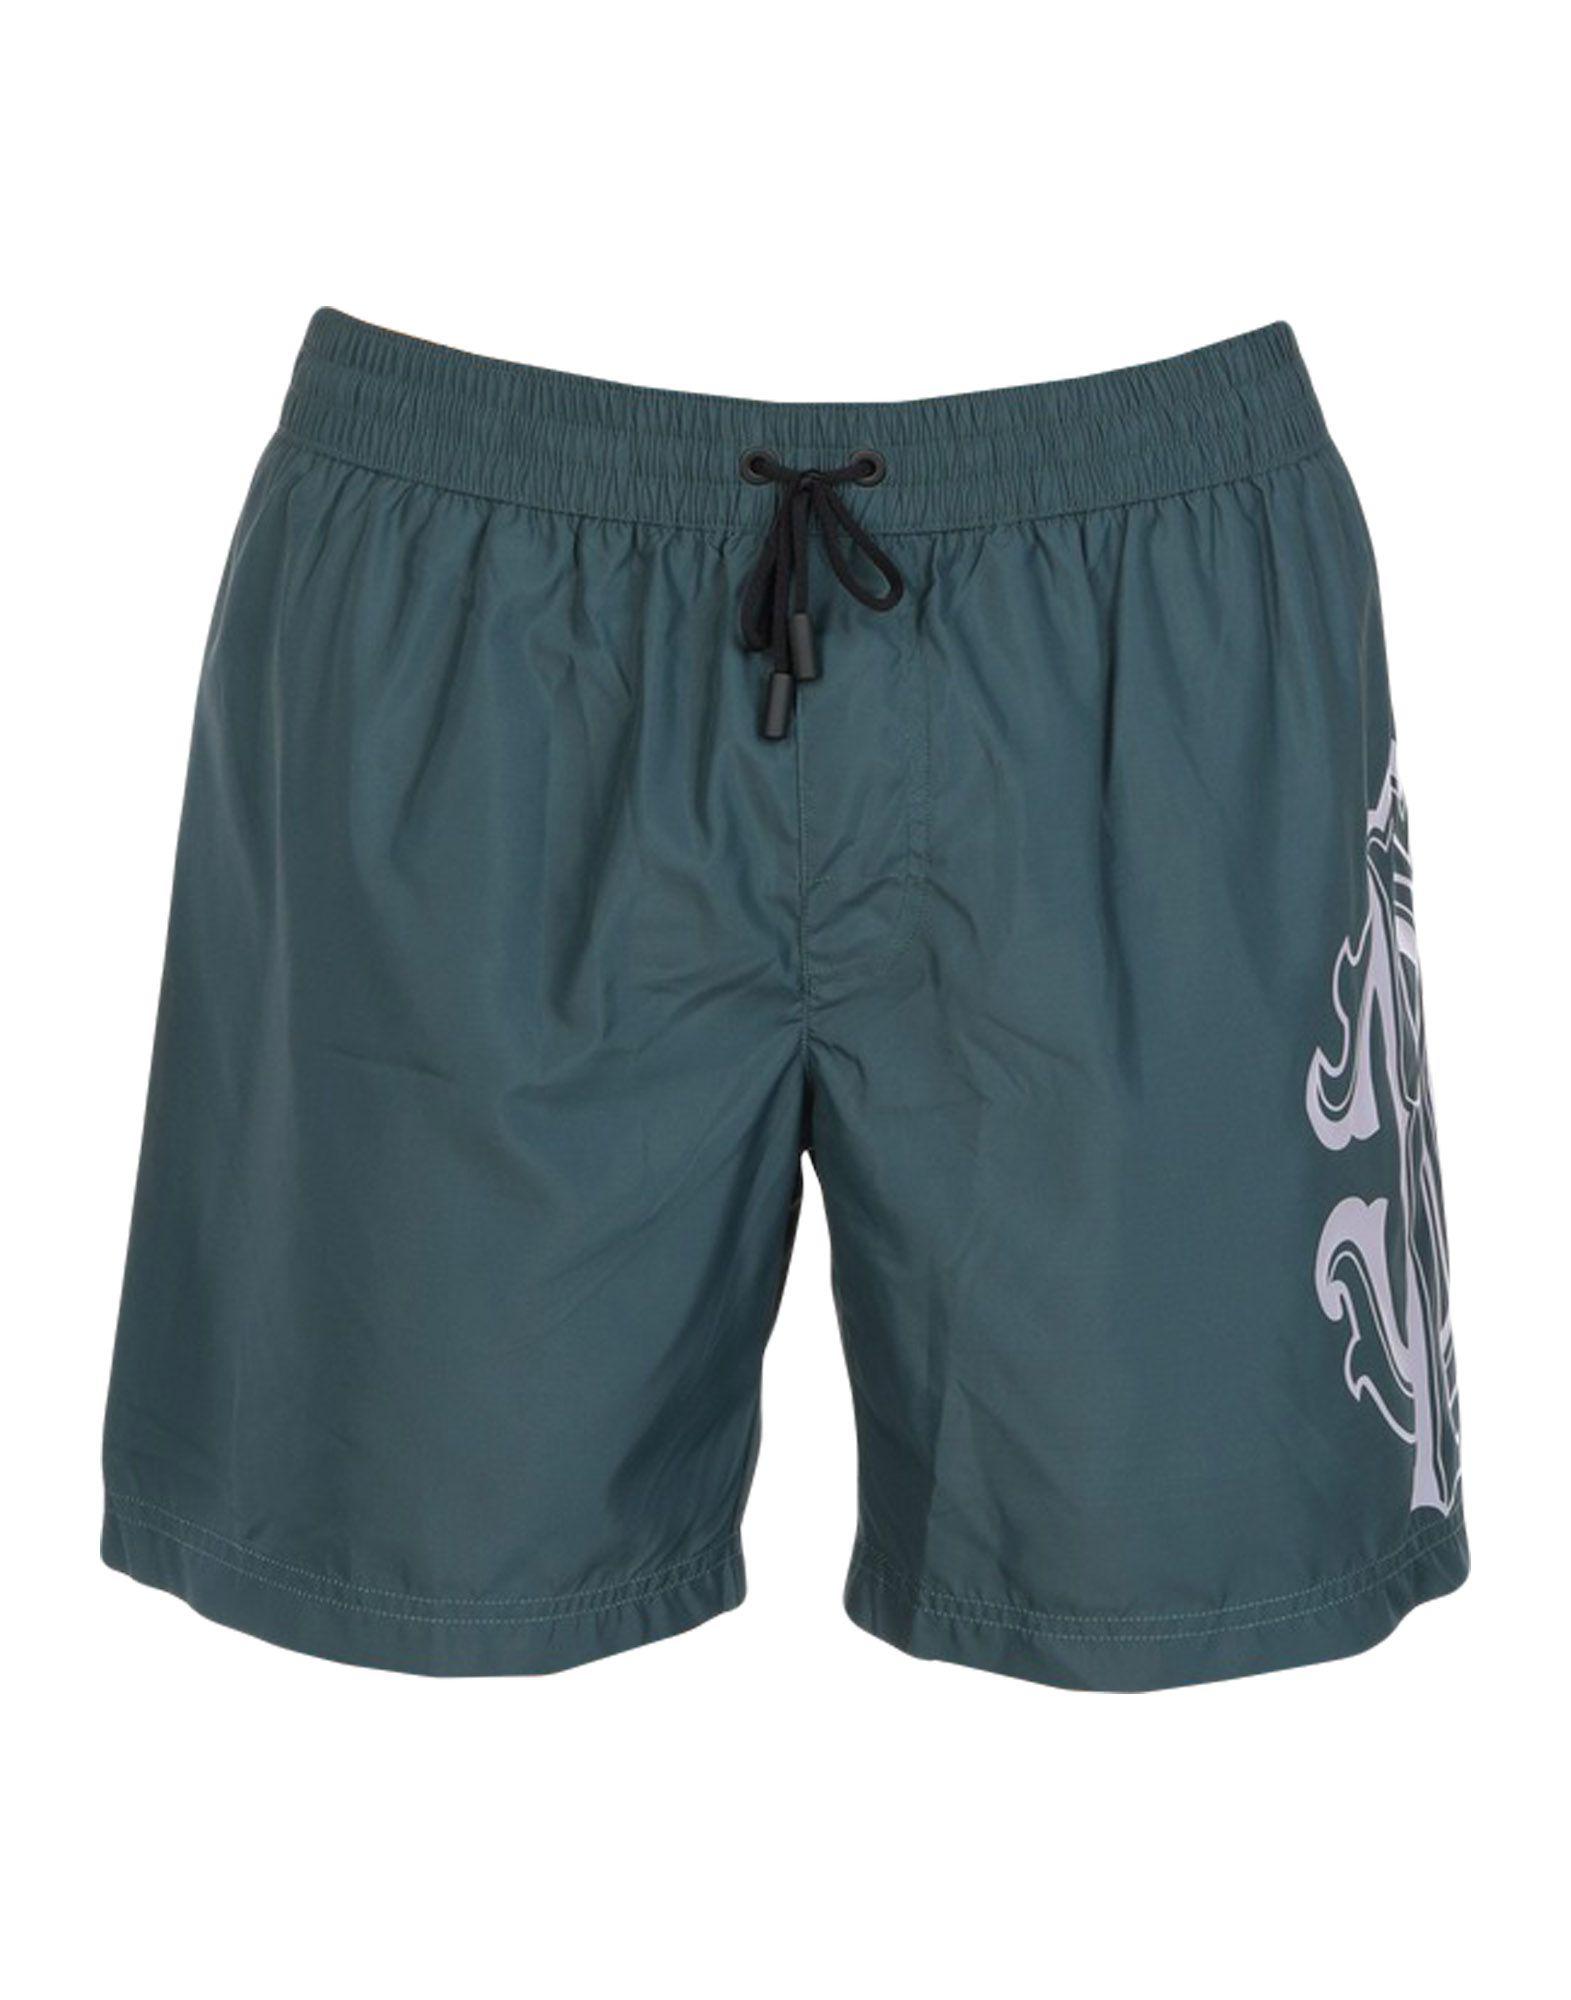 Roberto Cavalli Beachwear Swim Shorts In Dark Green